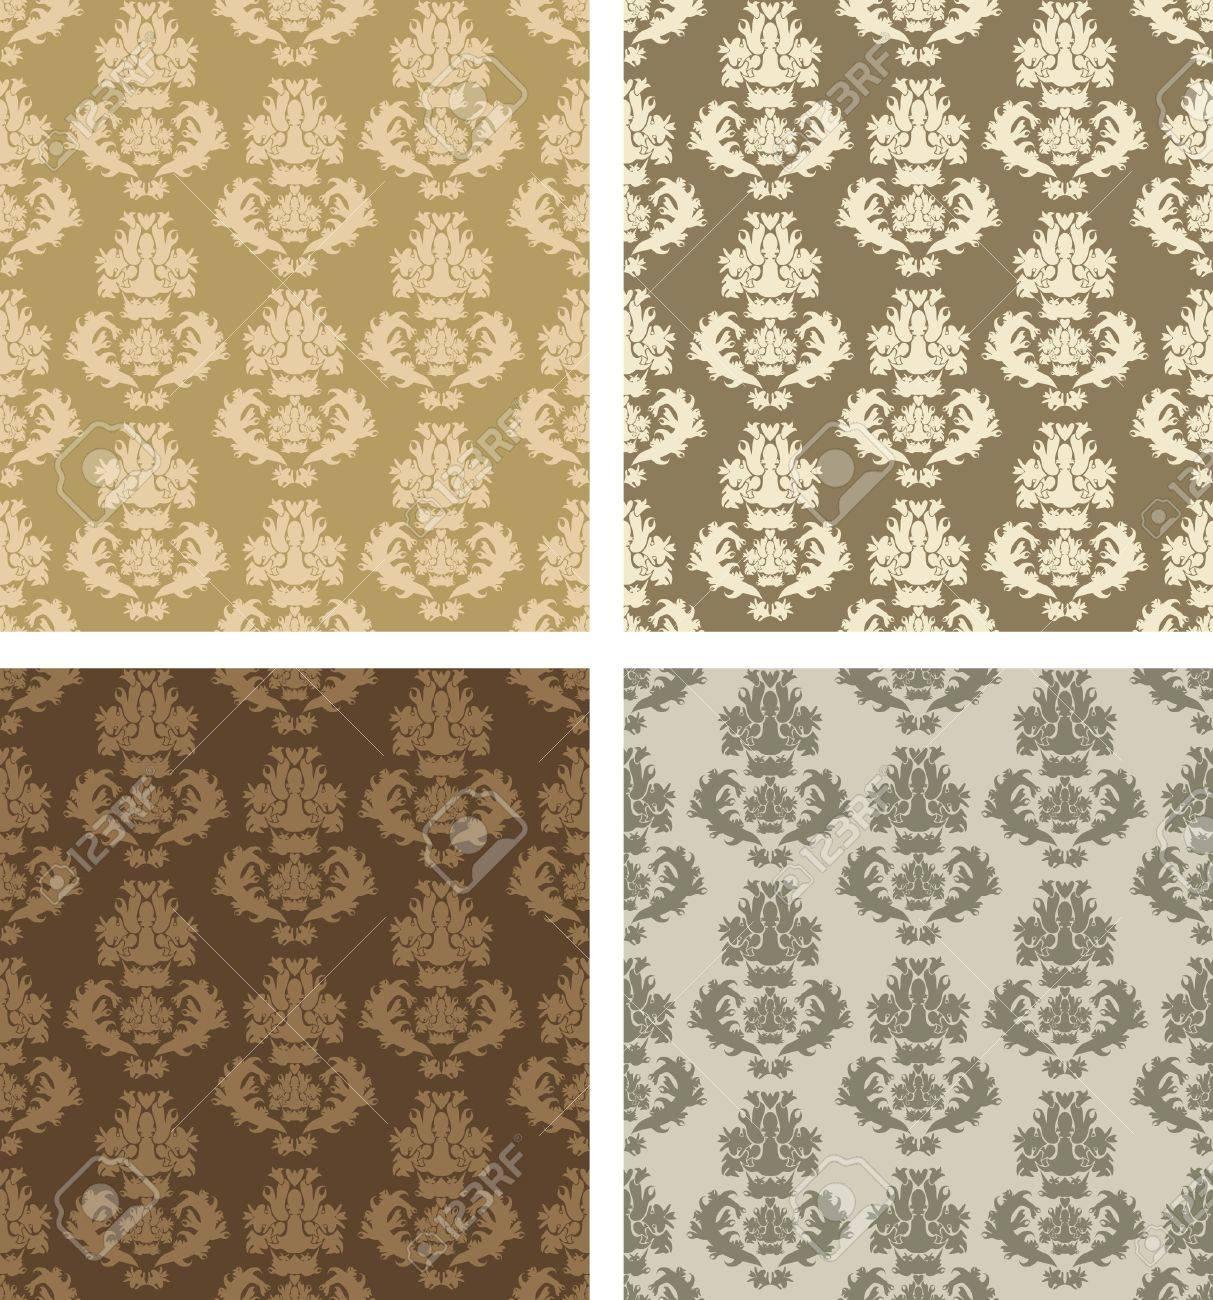 damask patterns Stock Vector - 10549049